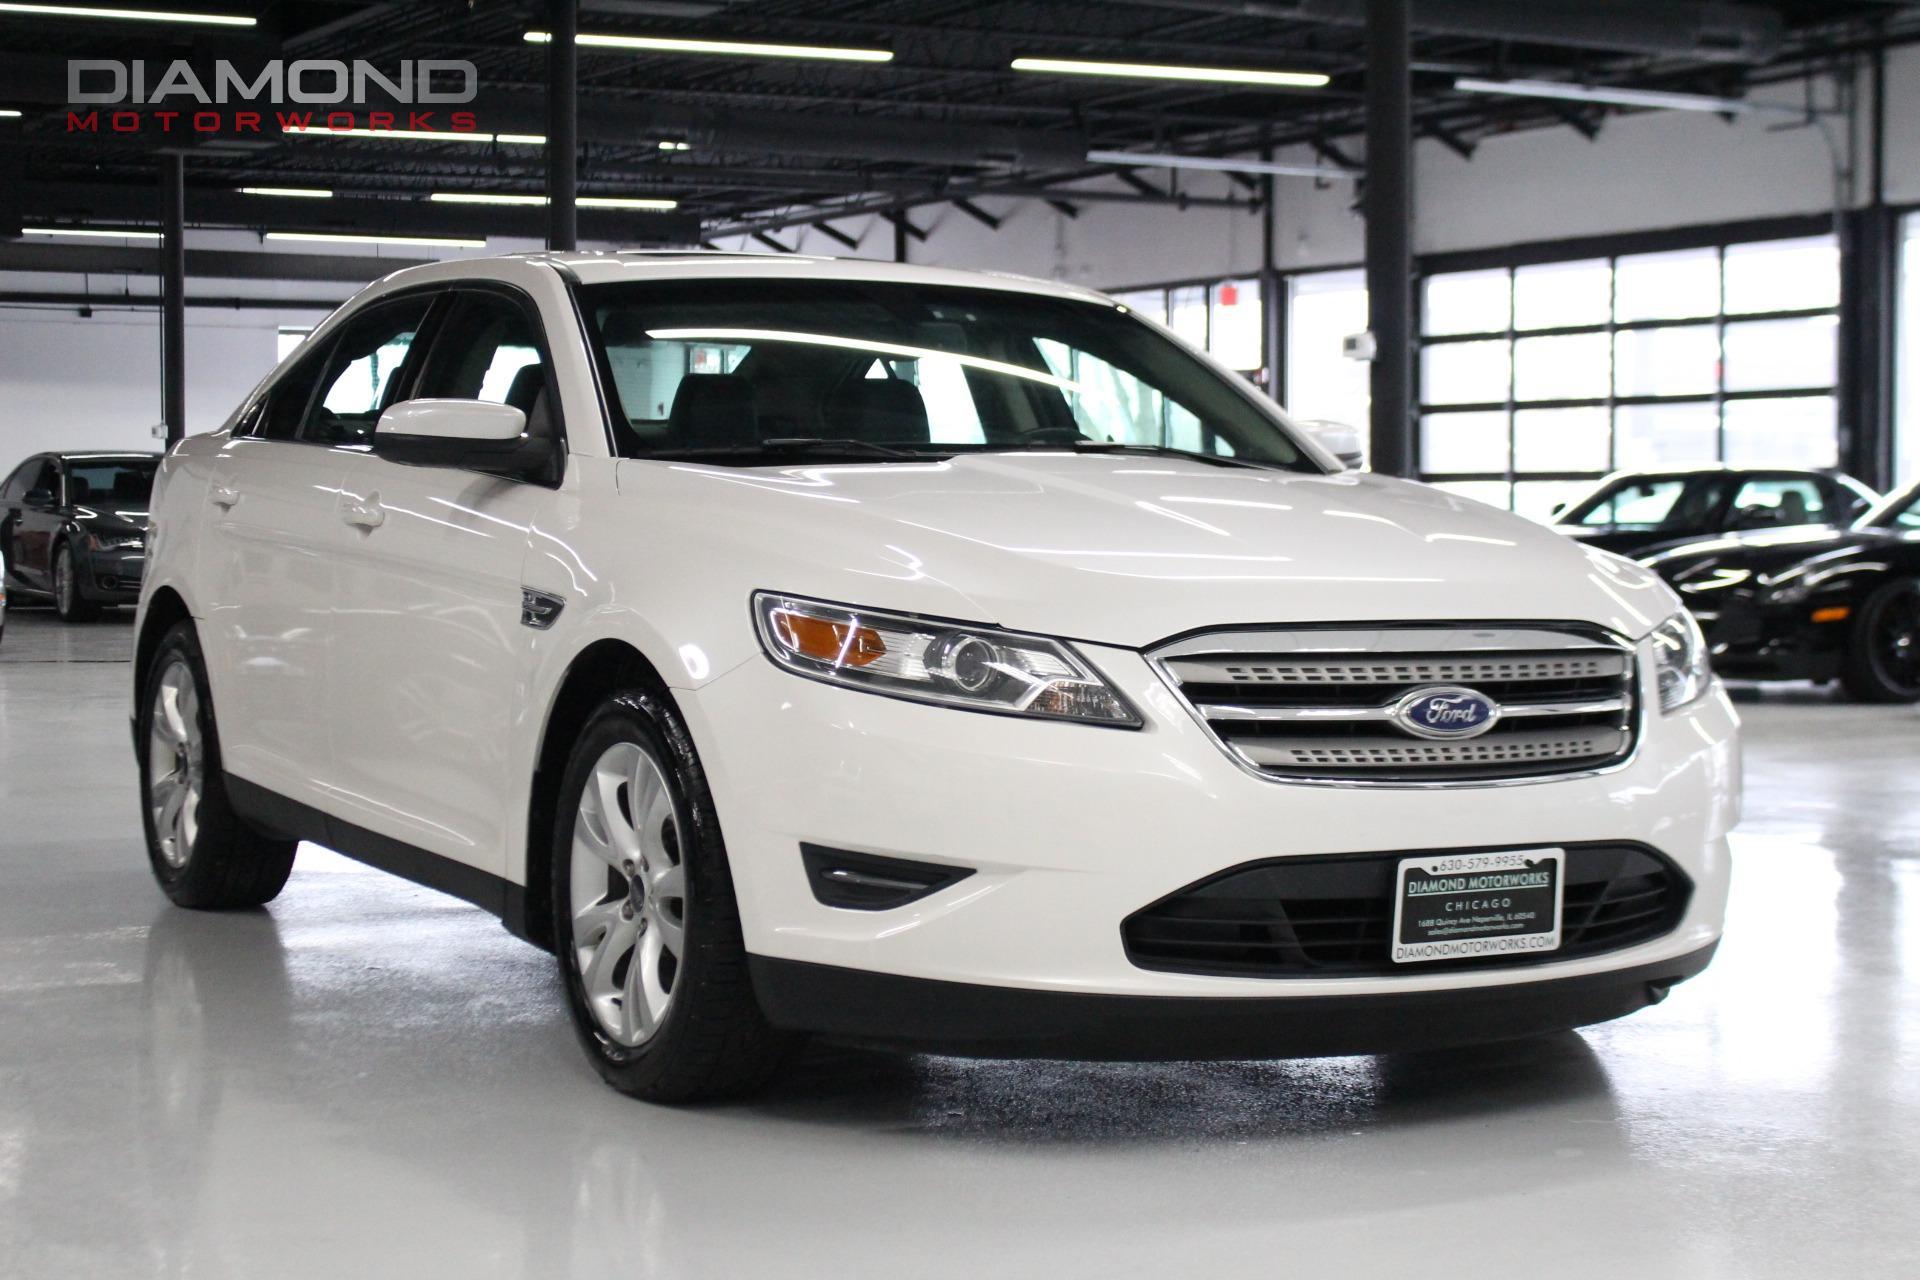 2011 Ford Taurus SEL Stock for sale near Lisle